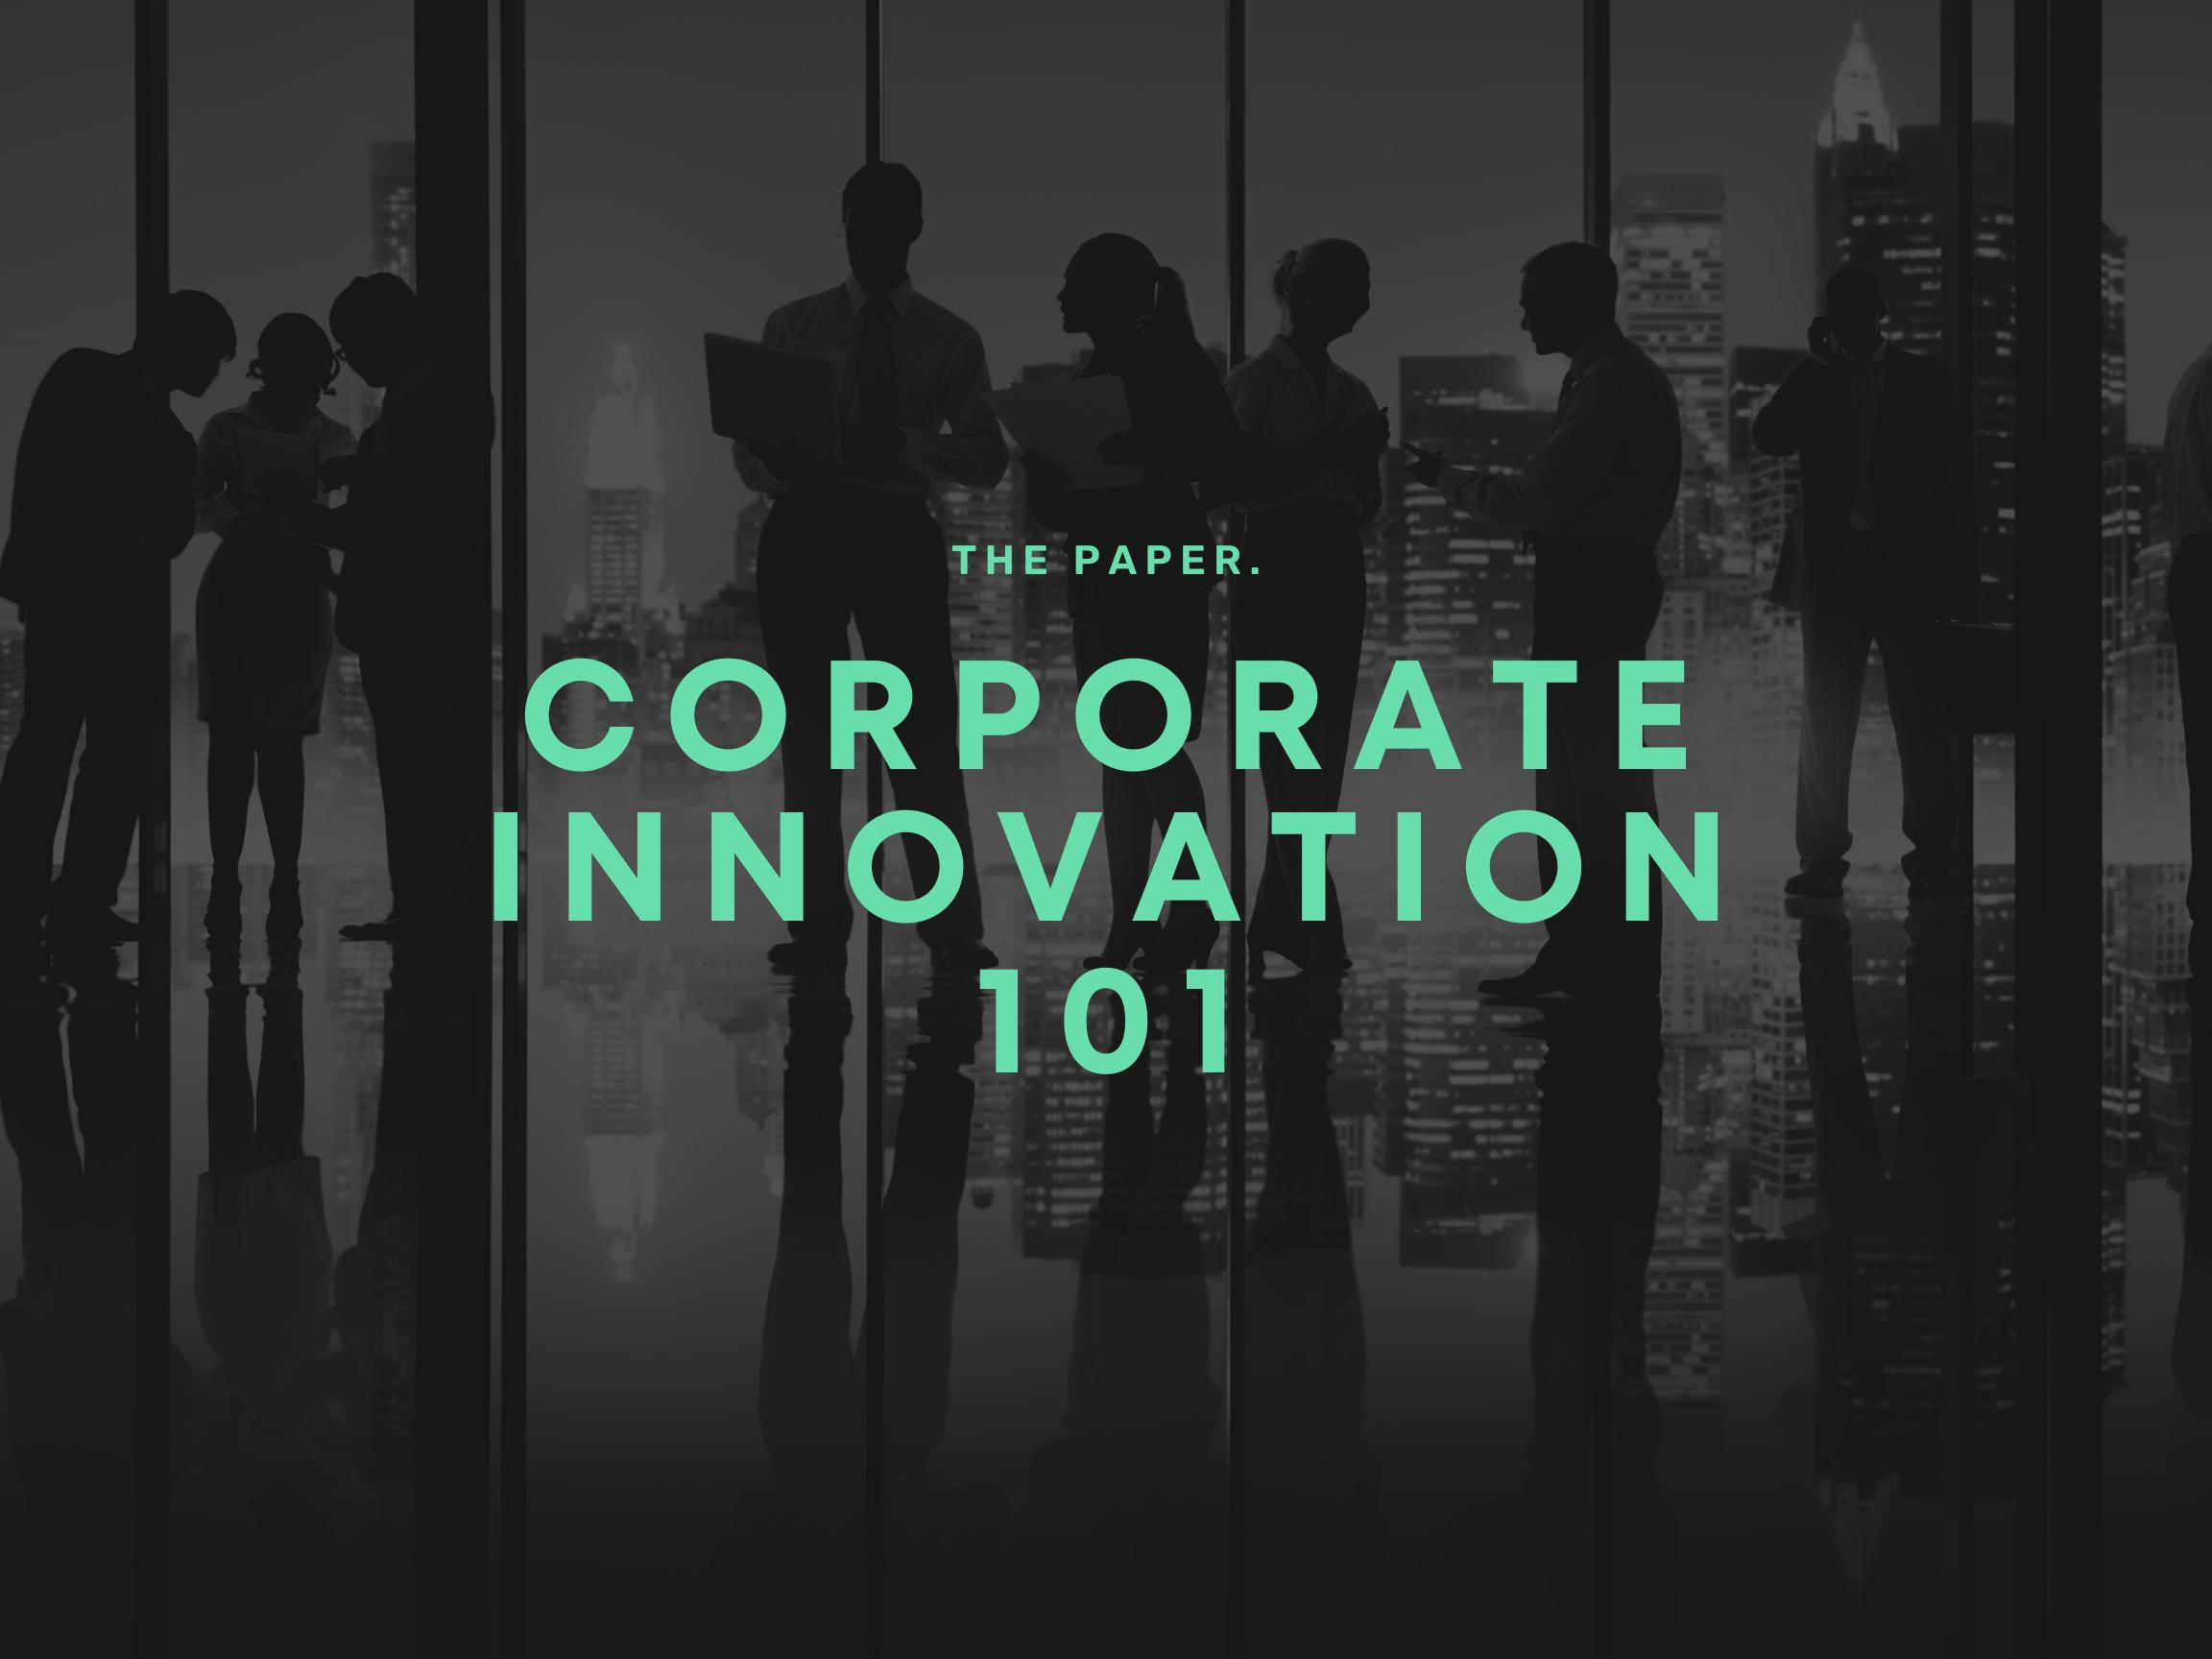 CORPORATE INNOVATION 101